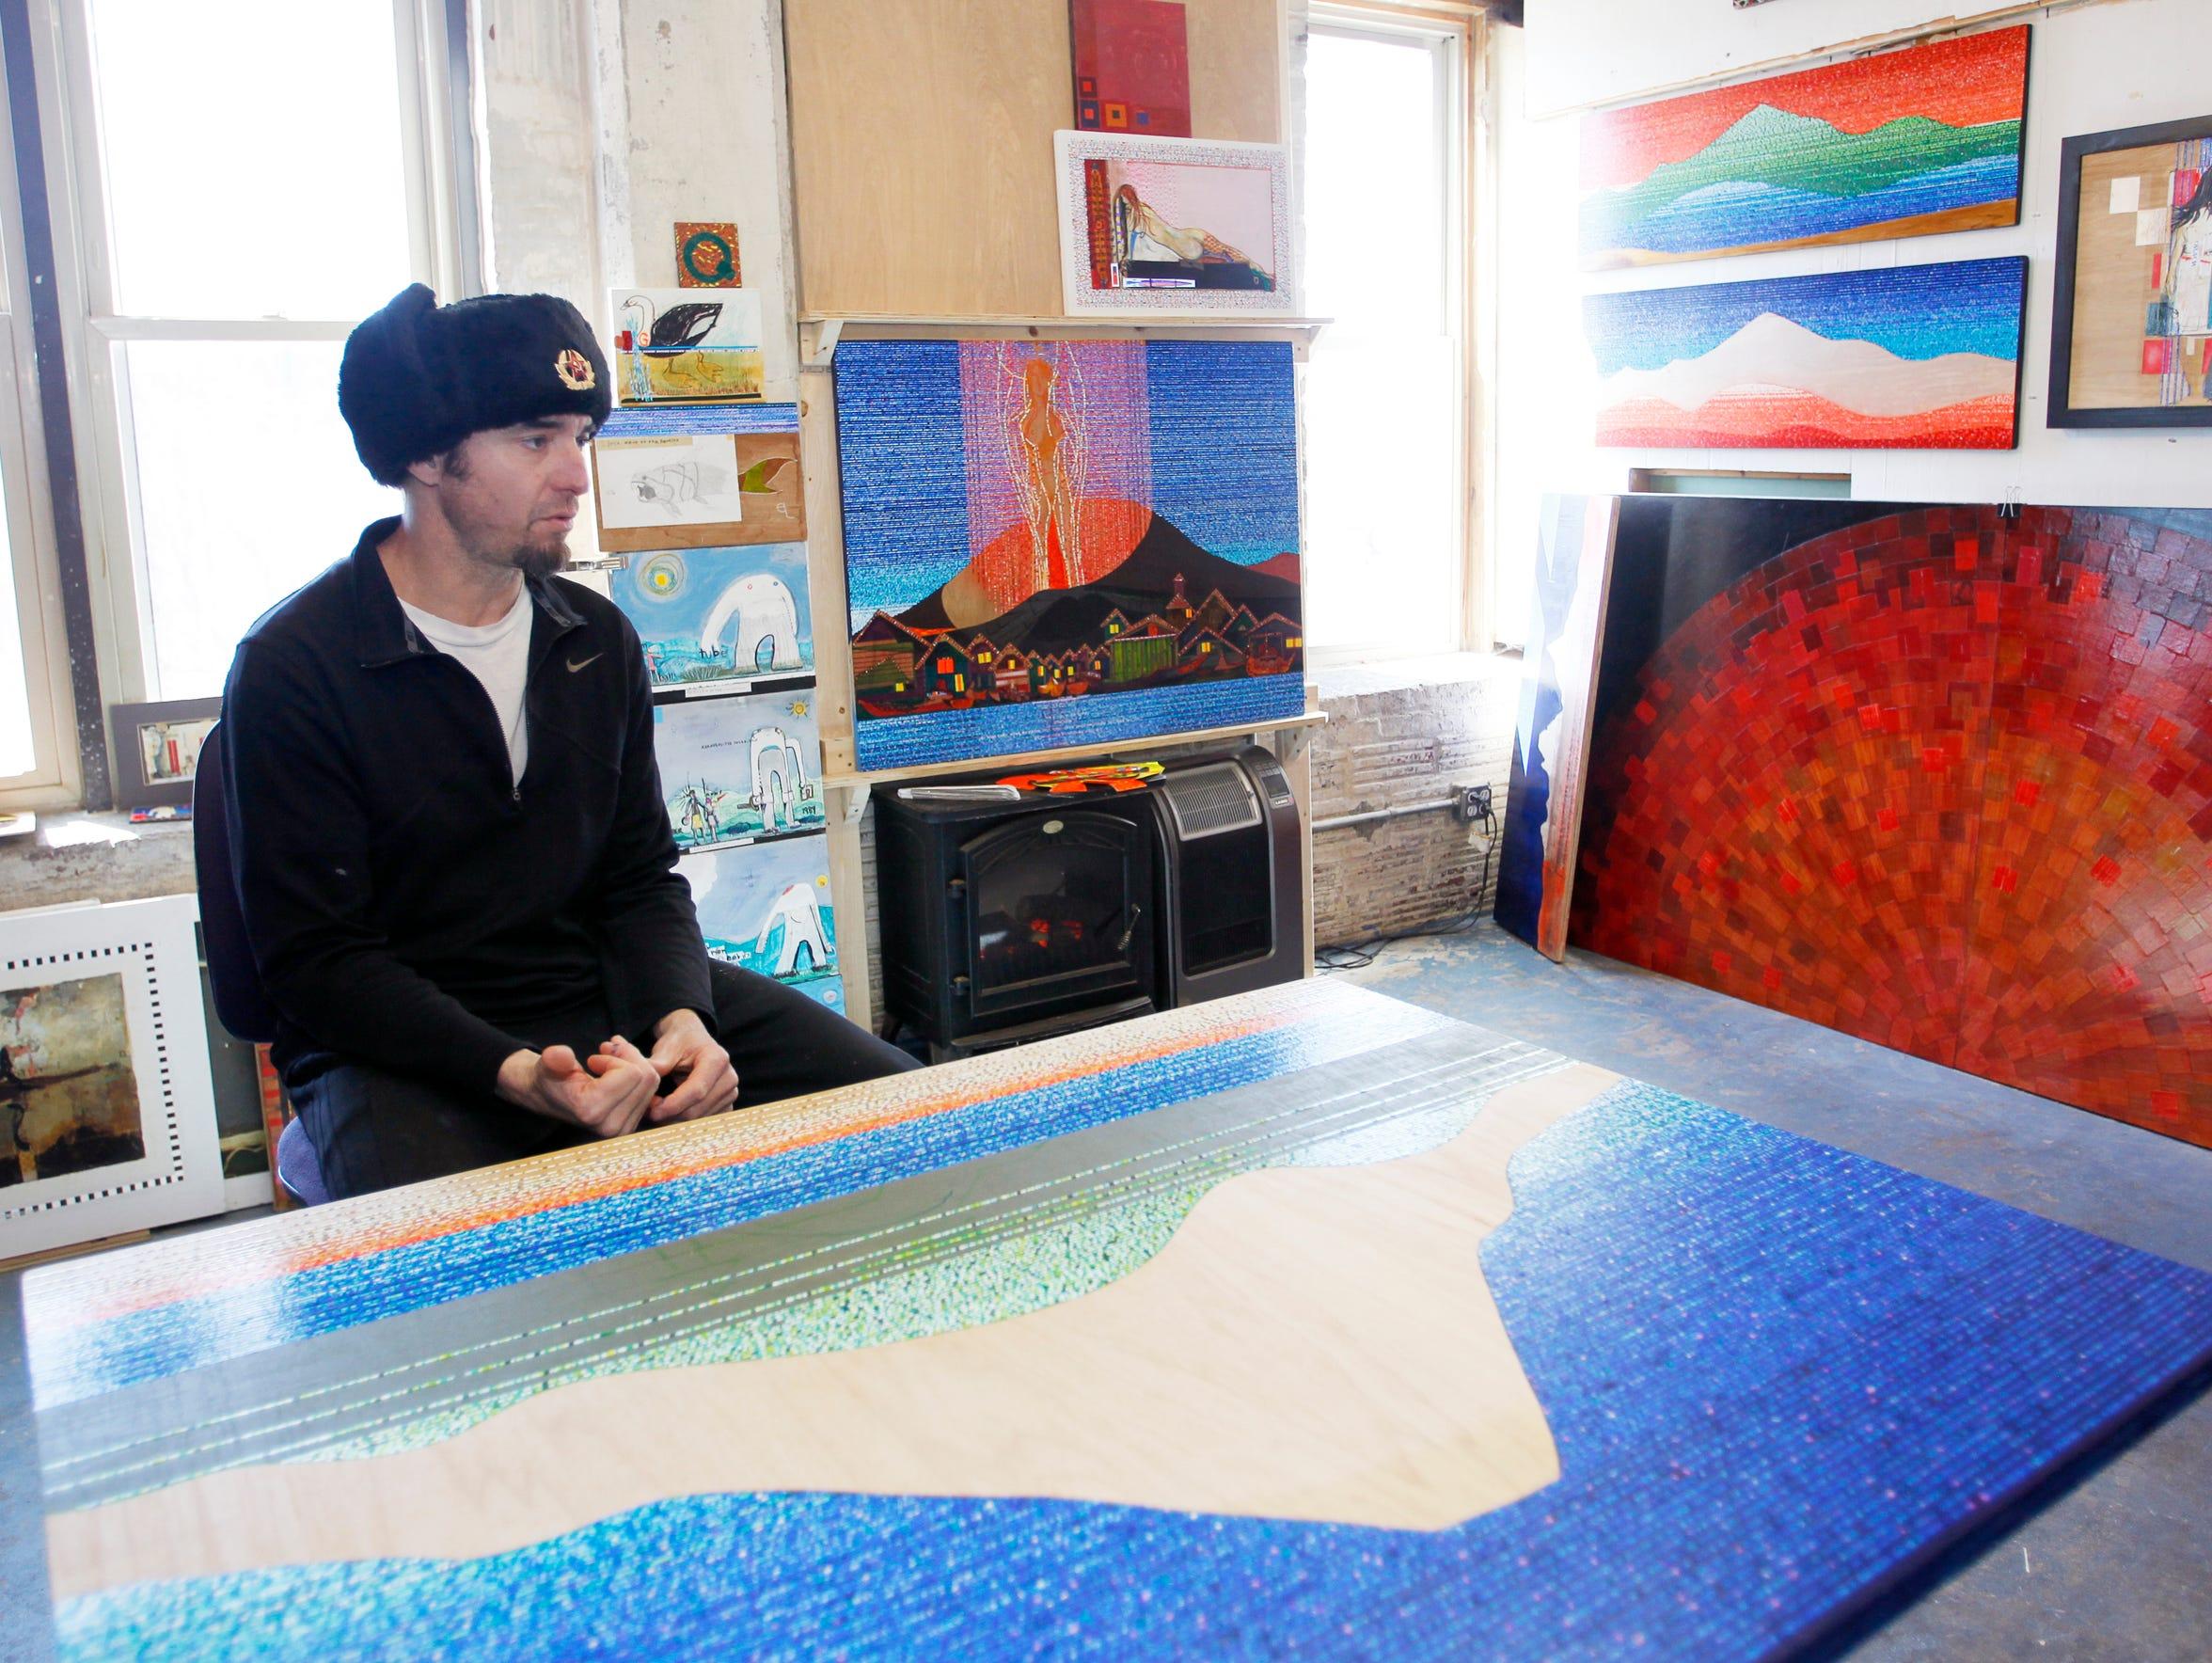 Artist Stephen Lange works in his studio in the Phil